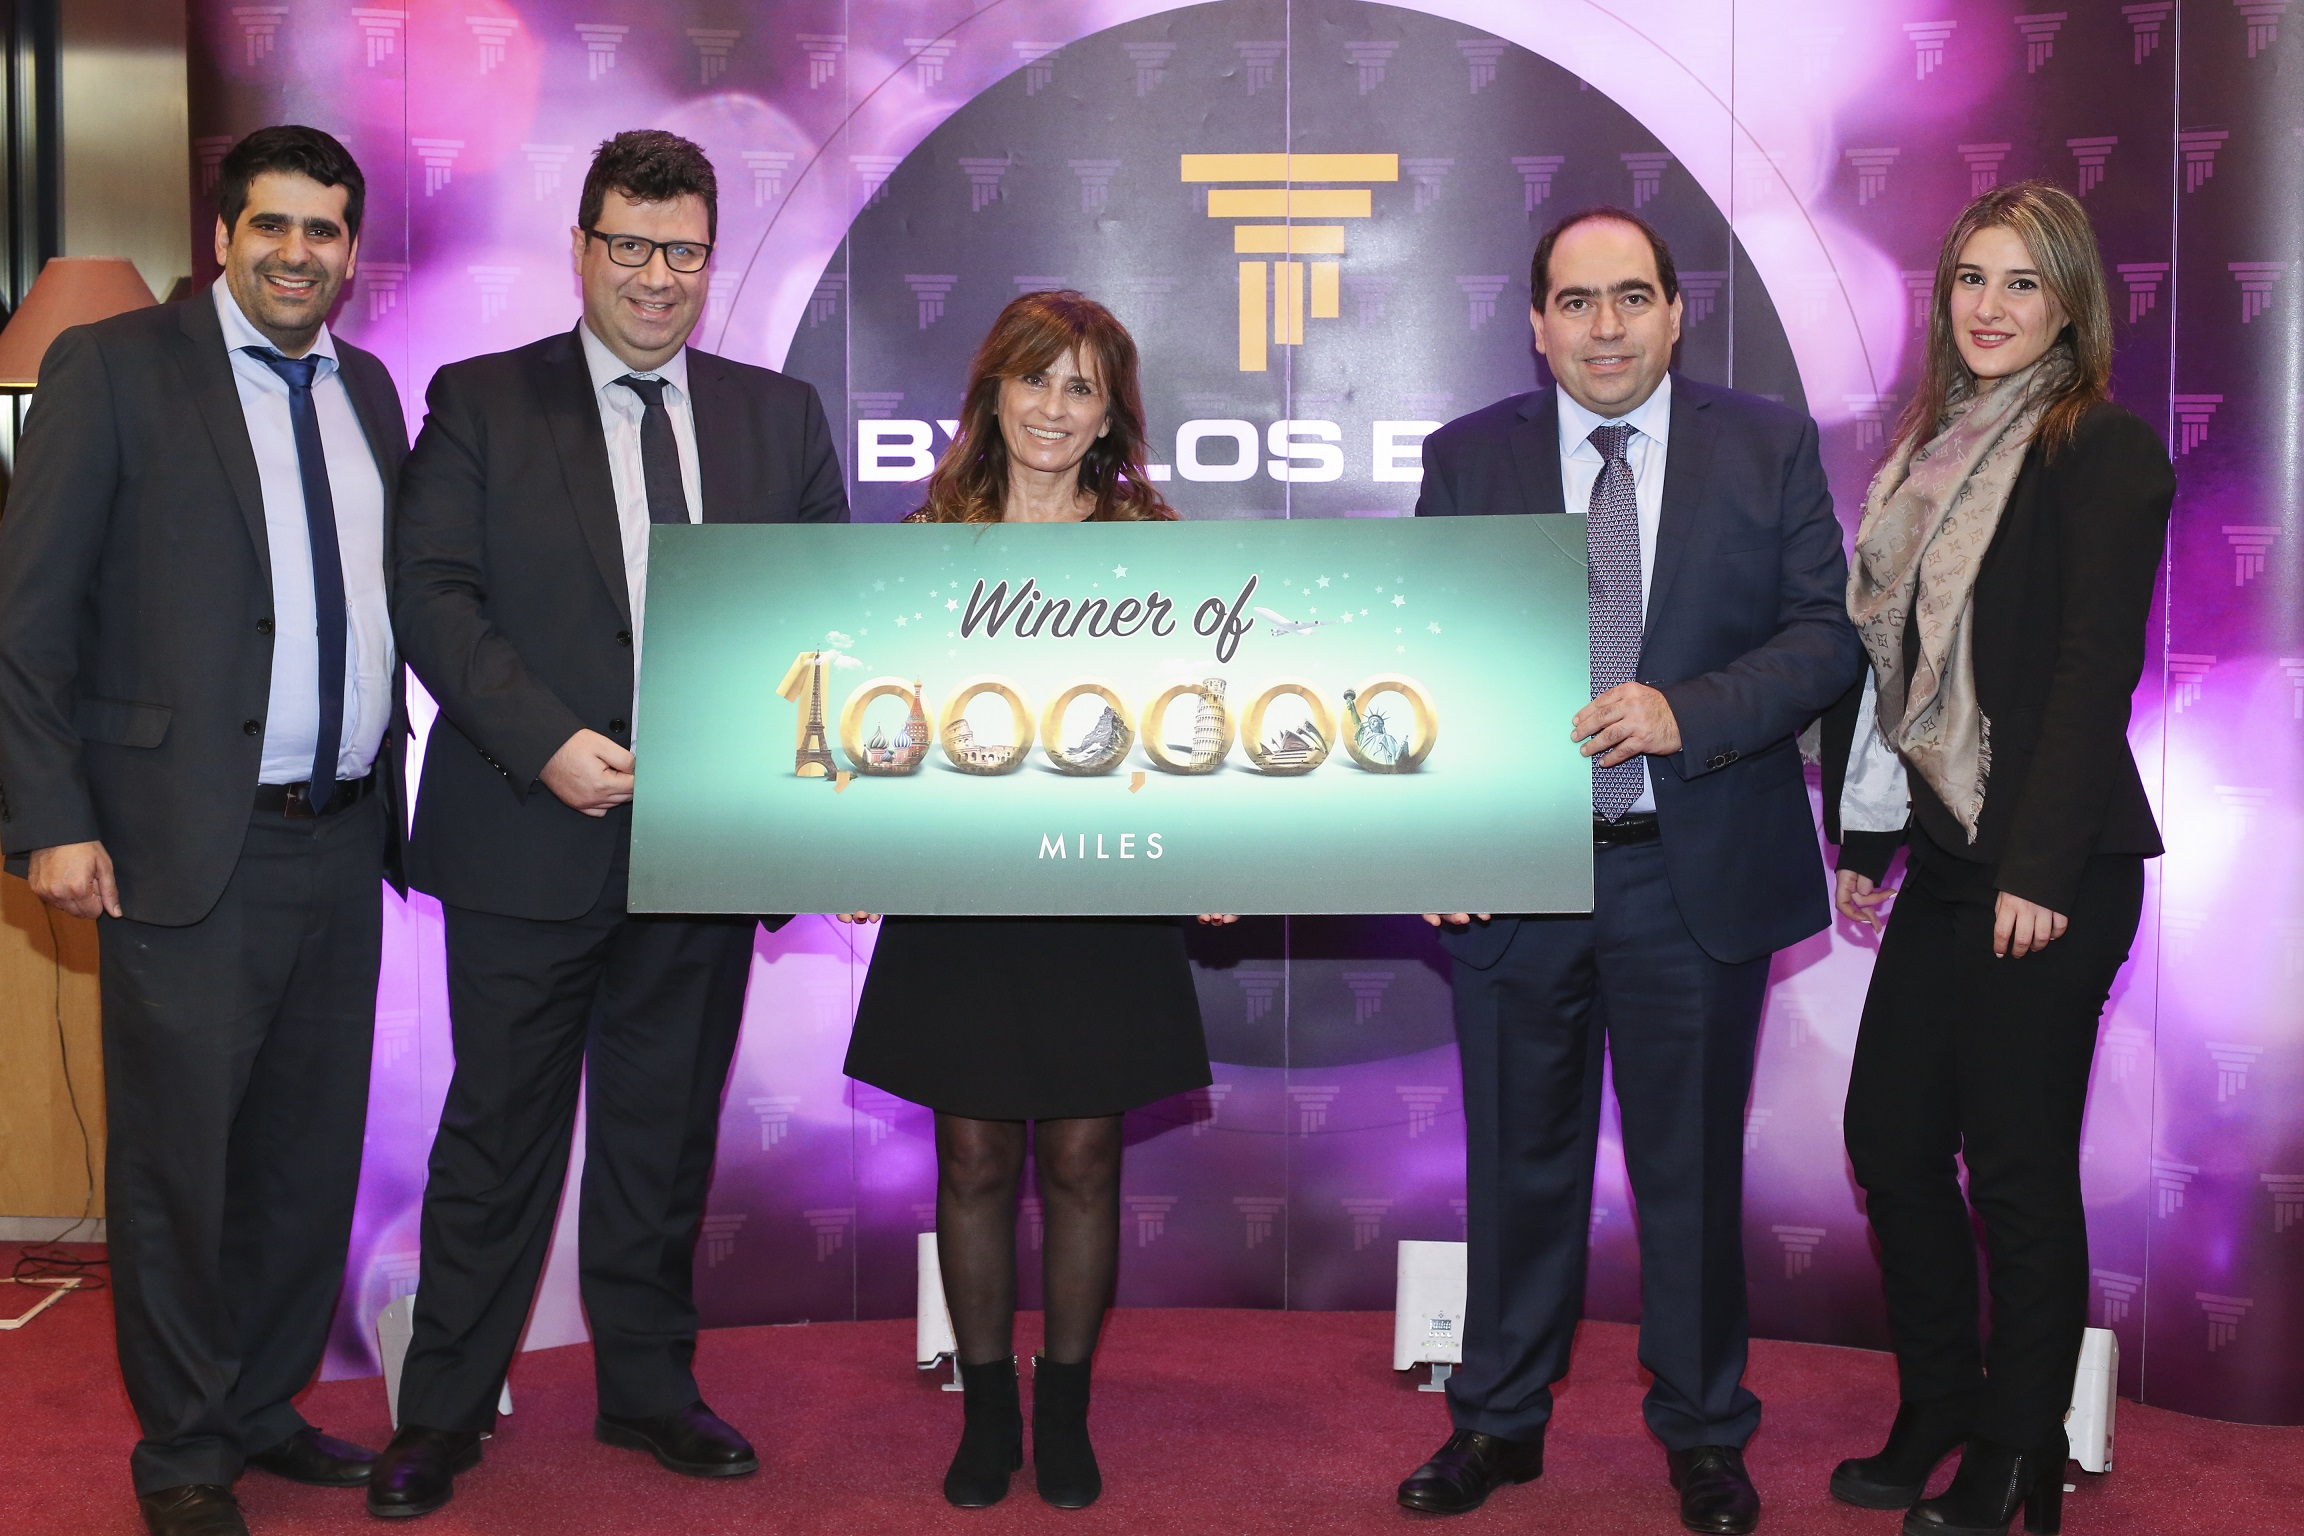 Mrs Samira Zina - 1 Million Miles - Byblos Bank